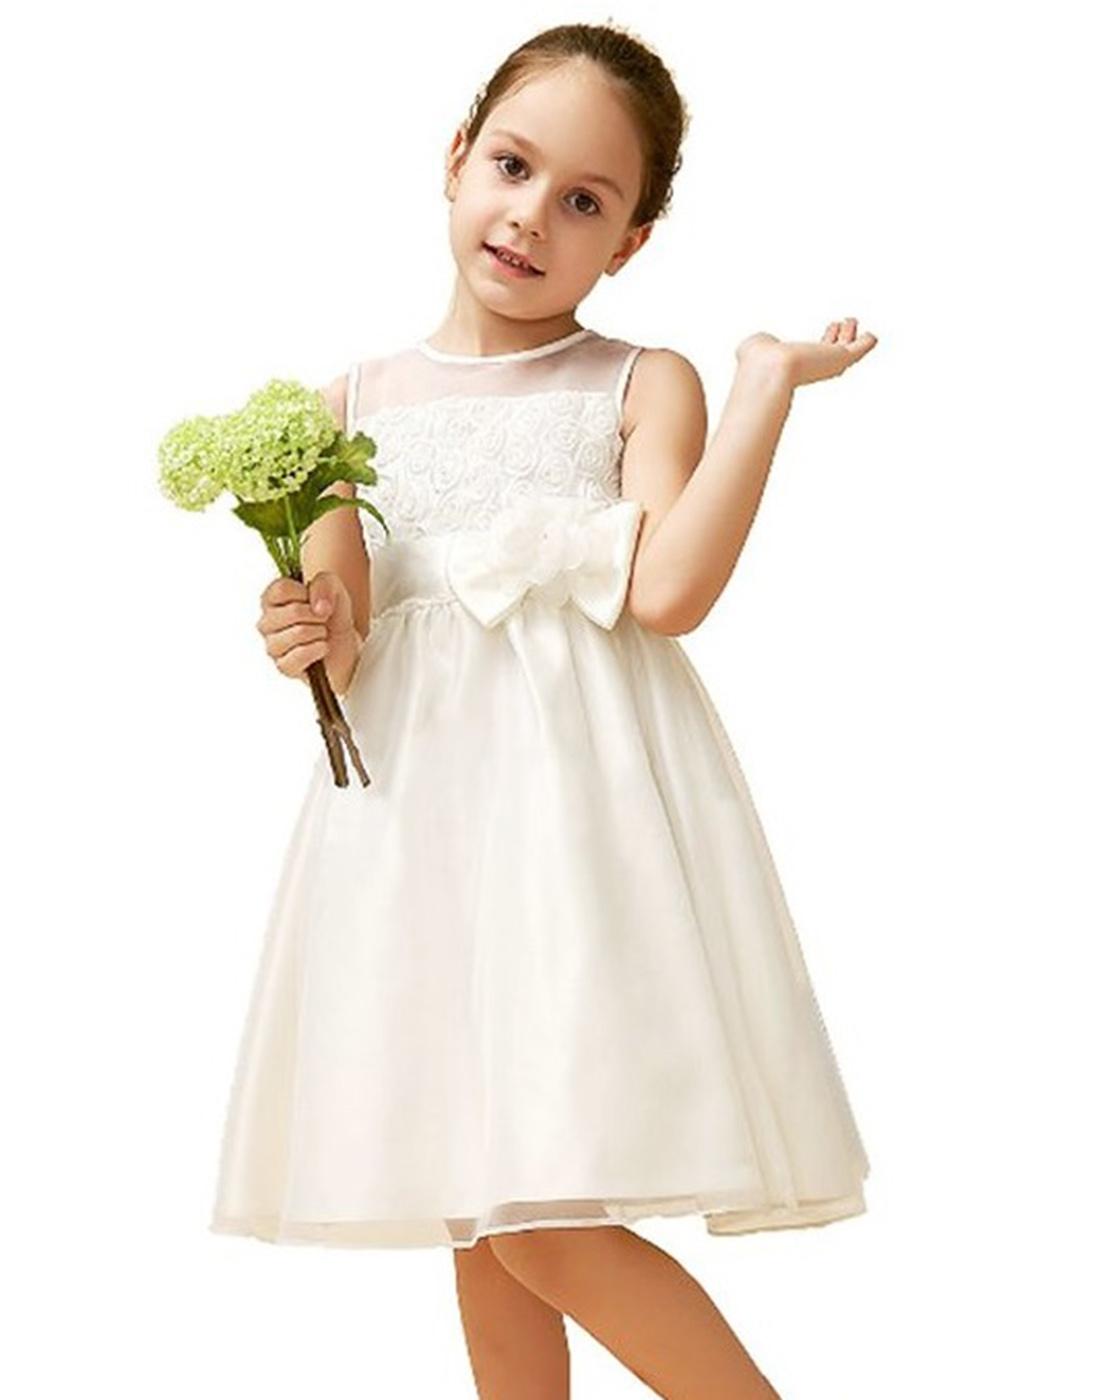 Eye Catching White Net And Silk Tulle Flower Girl Dress Party Dress